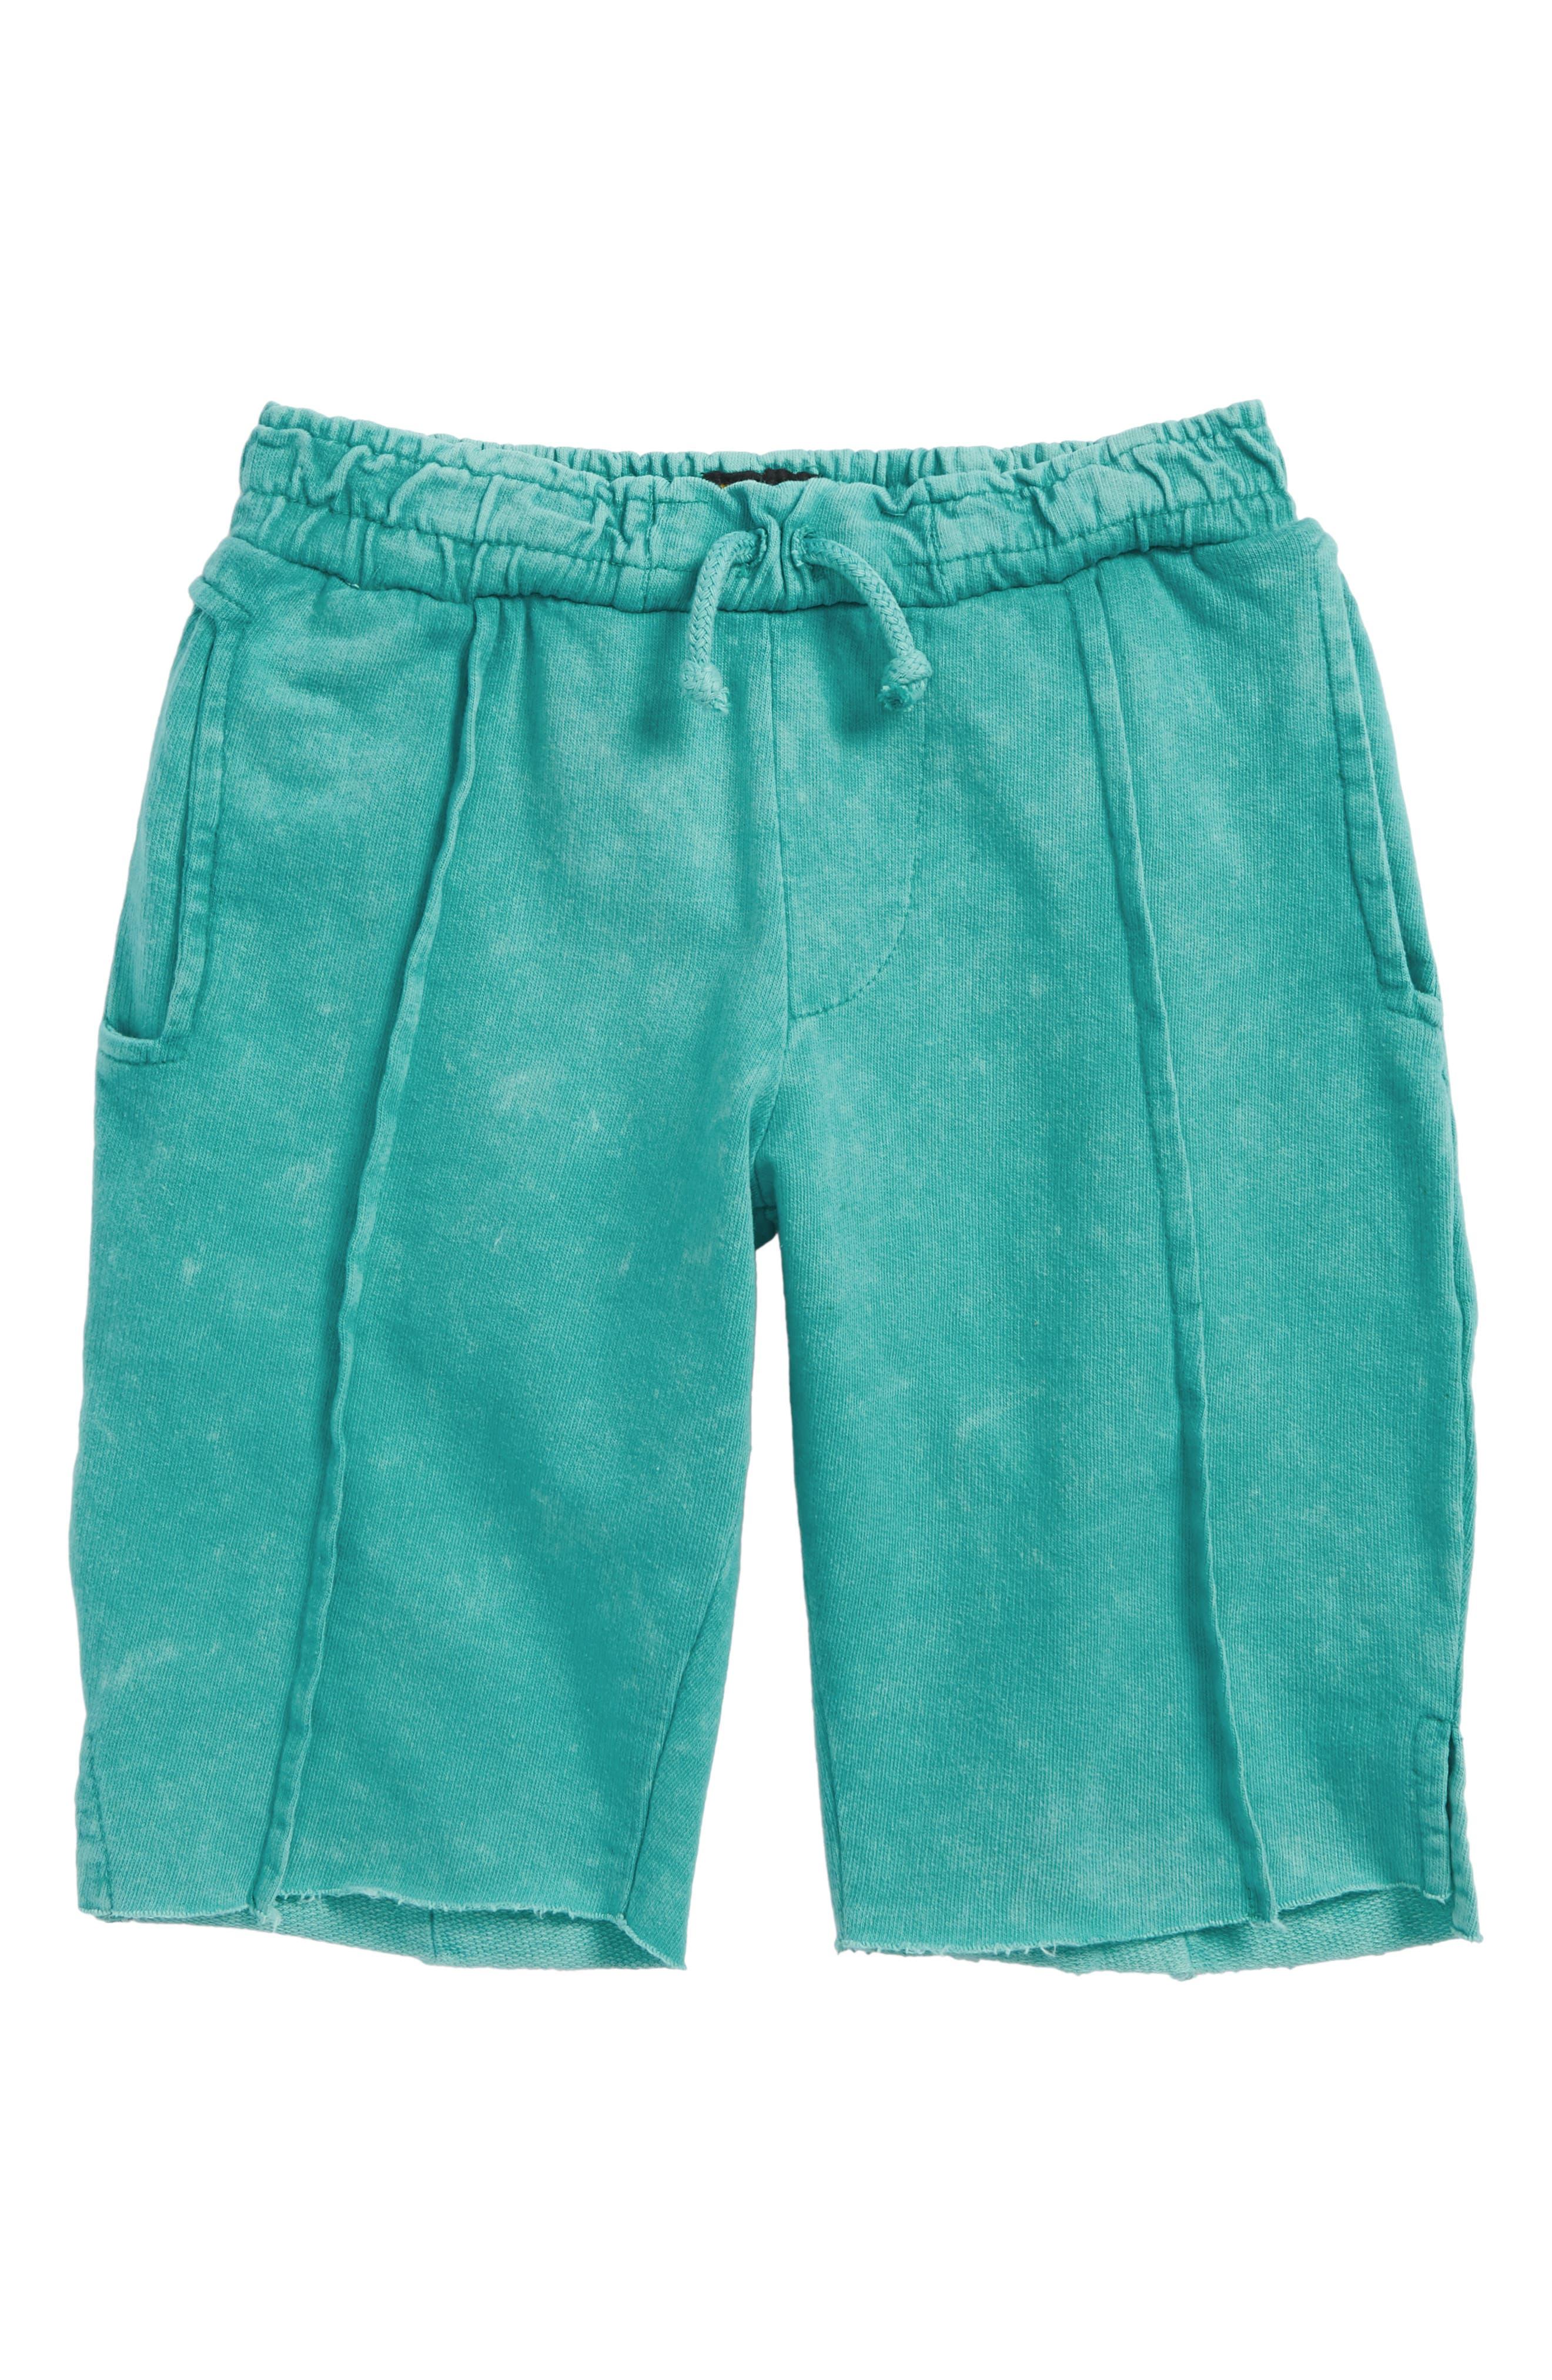 Alternate Image 1 Selected - Lee Acid Wash Pull-On Shorts (Toddler Boys & Little Boys)